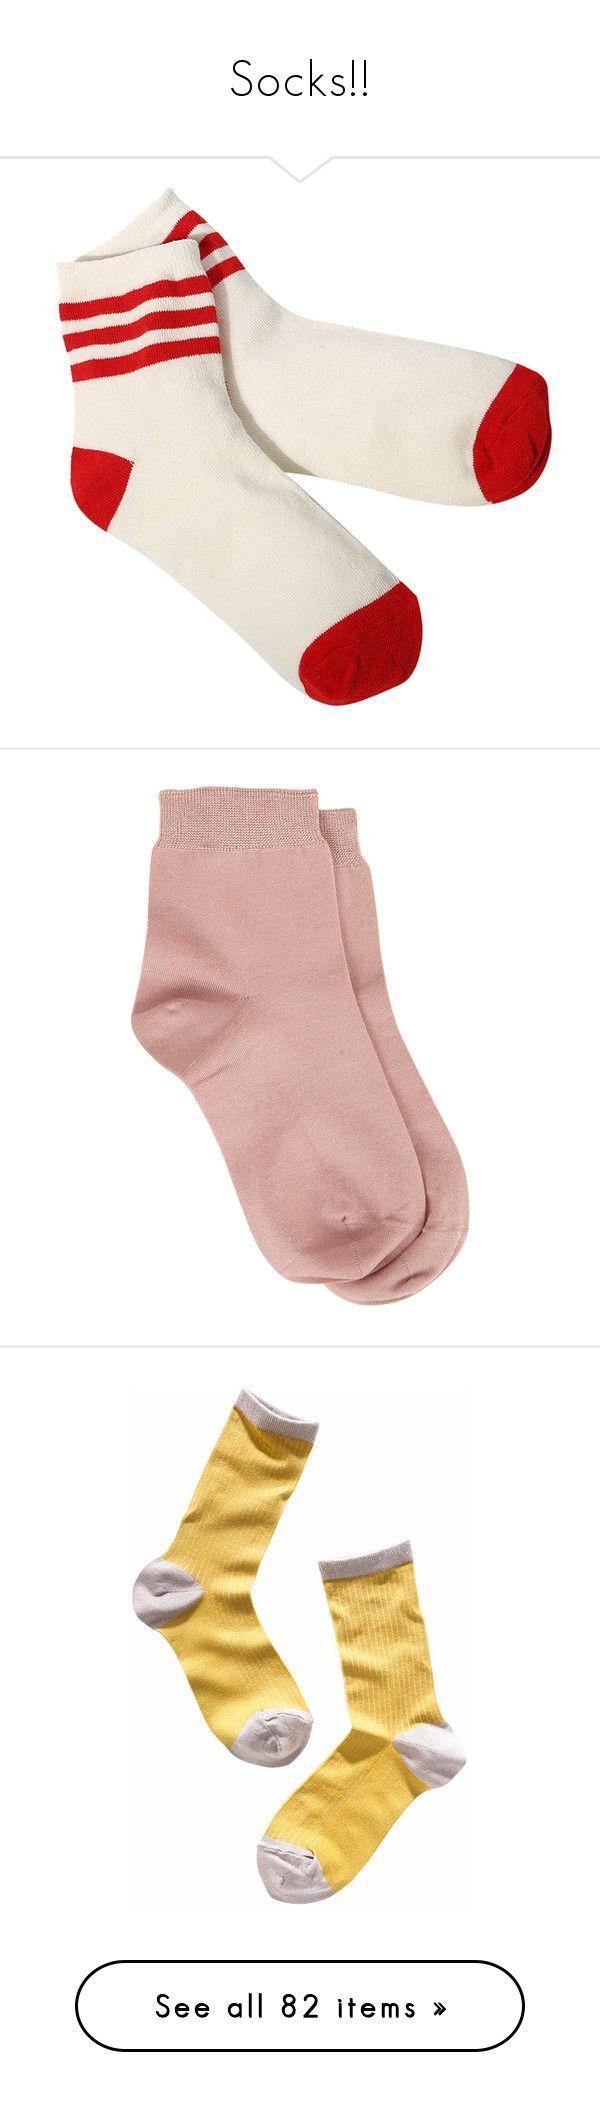 """Socks!!"" by snakehandjimmy ❤ liked on Polyvore featuring intimates, hosiery, socks, red, clothing - socks, striped socks, stripe socks, striped baseball socks, striped cotton socks and cotton socks"